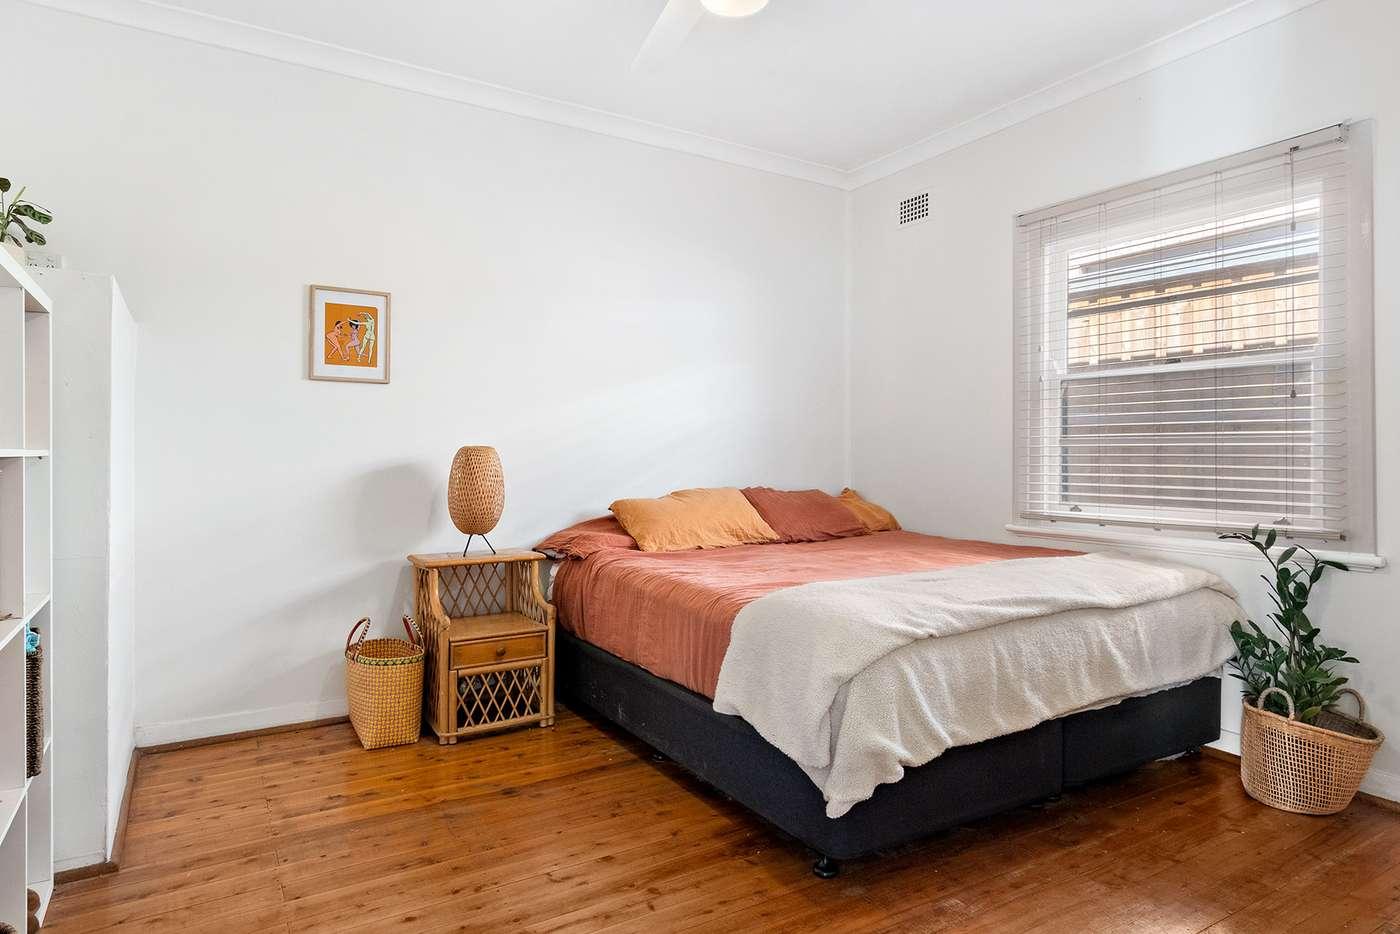 Sixth view of Homely house listing, 58 Birdwood Street, New Lambton NSW 2305